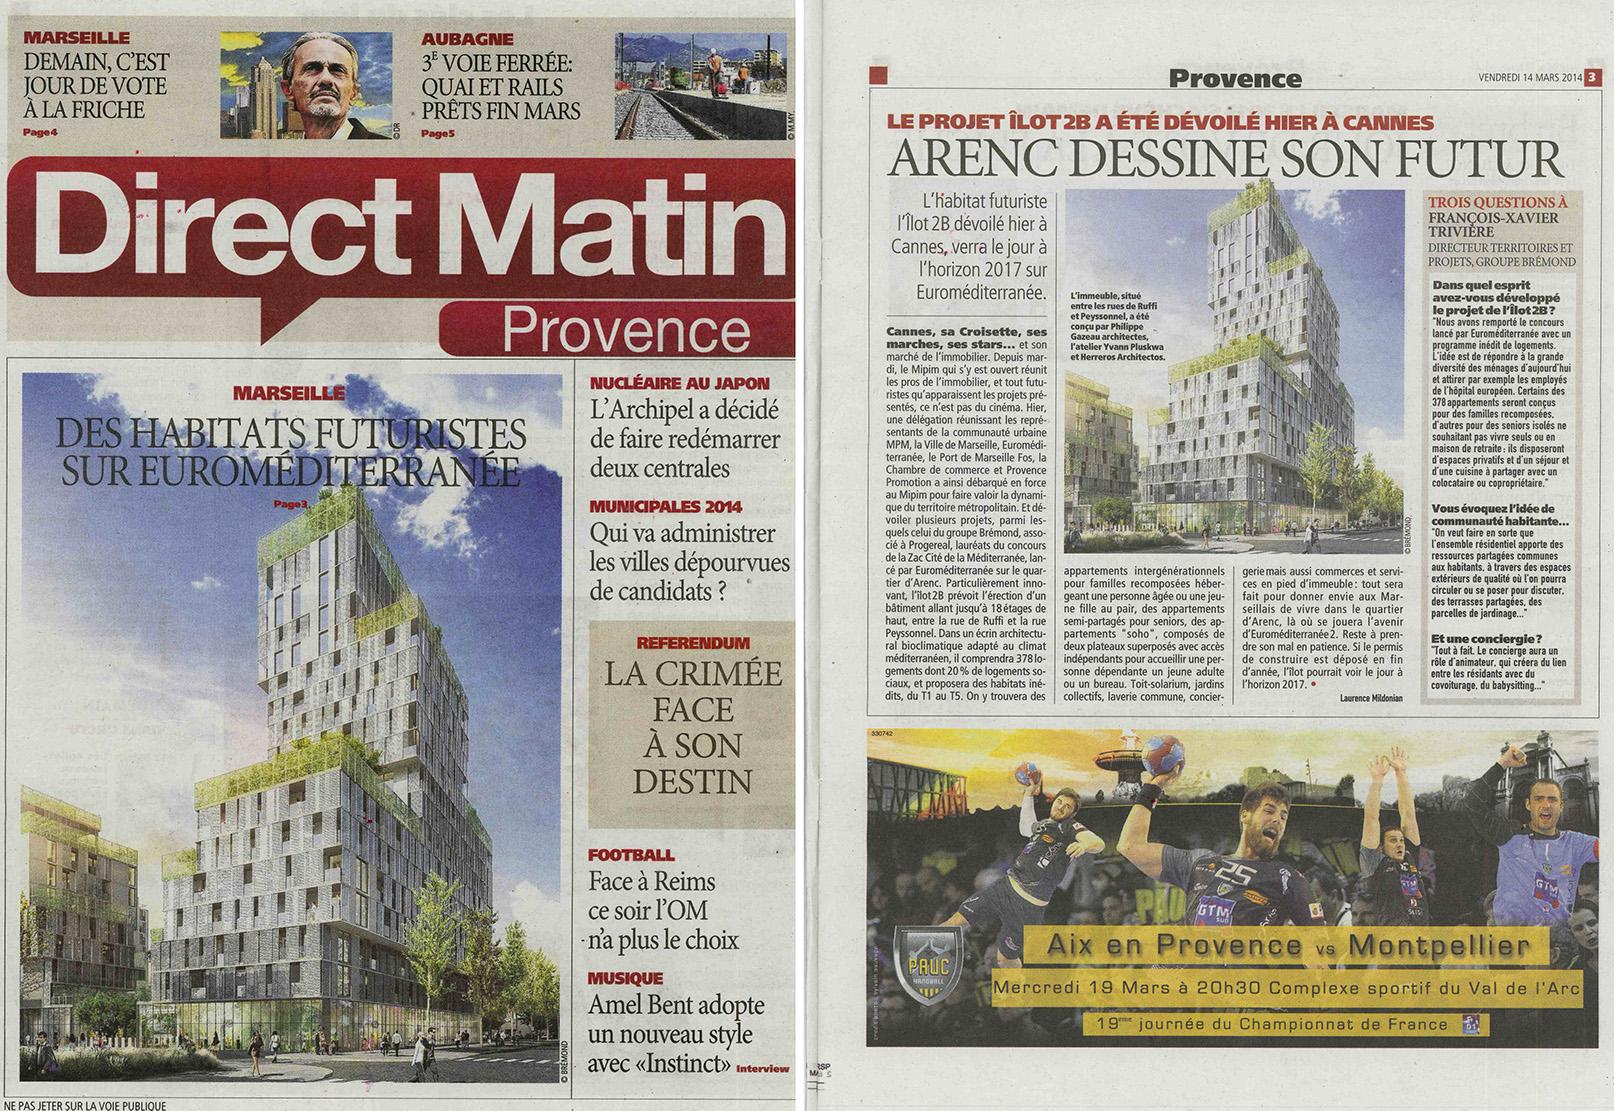 Direct Matin - Mars 2014